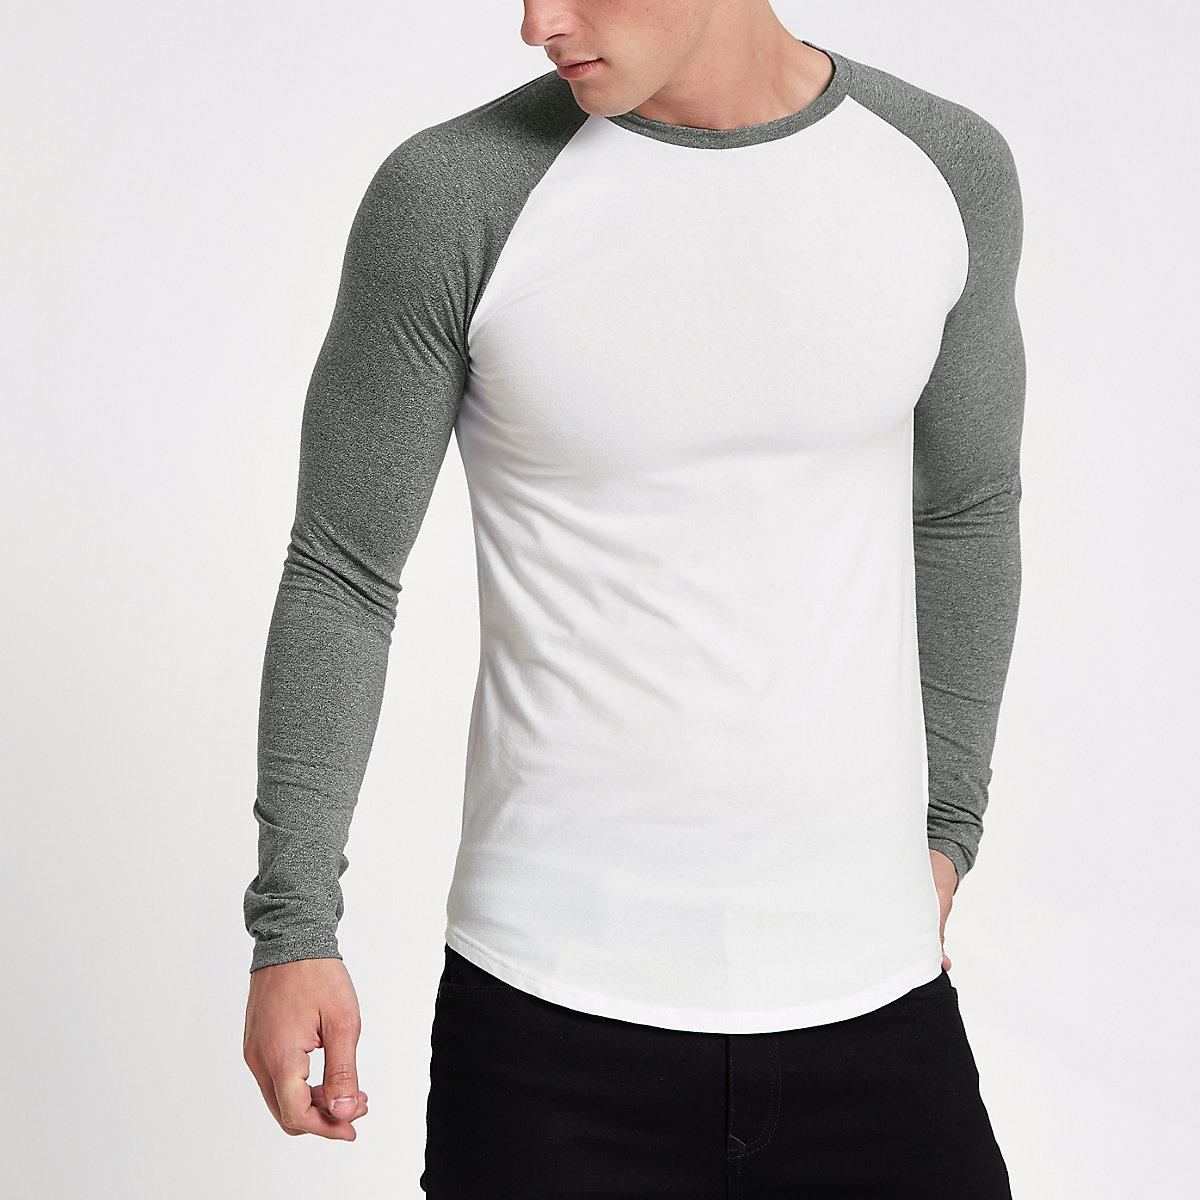 White raglan long sleeve muscle fit T-shirt